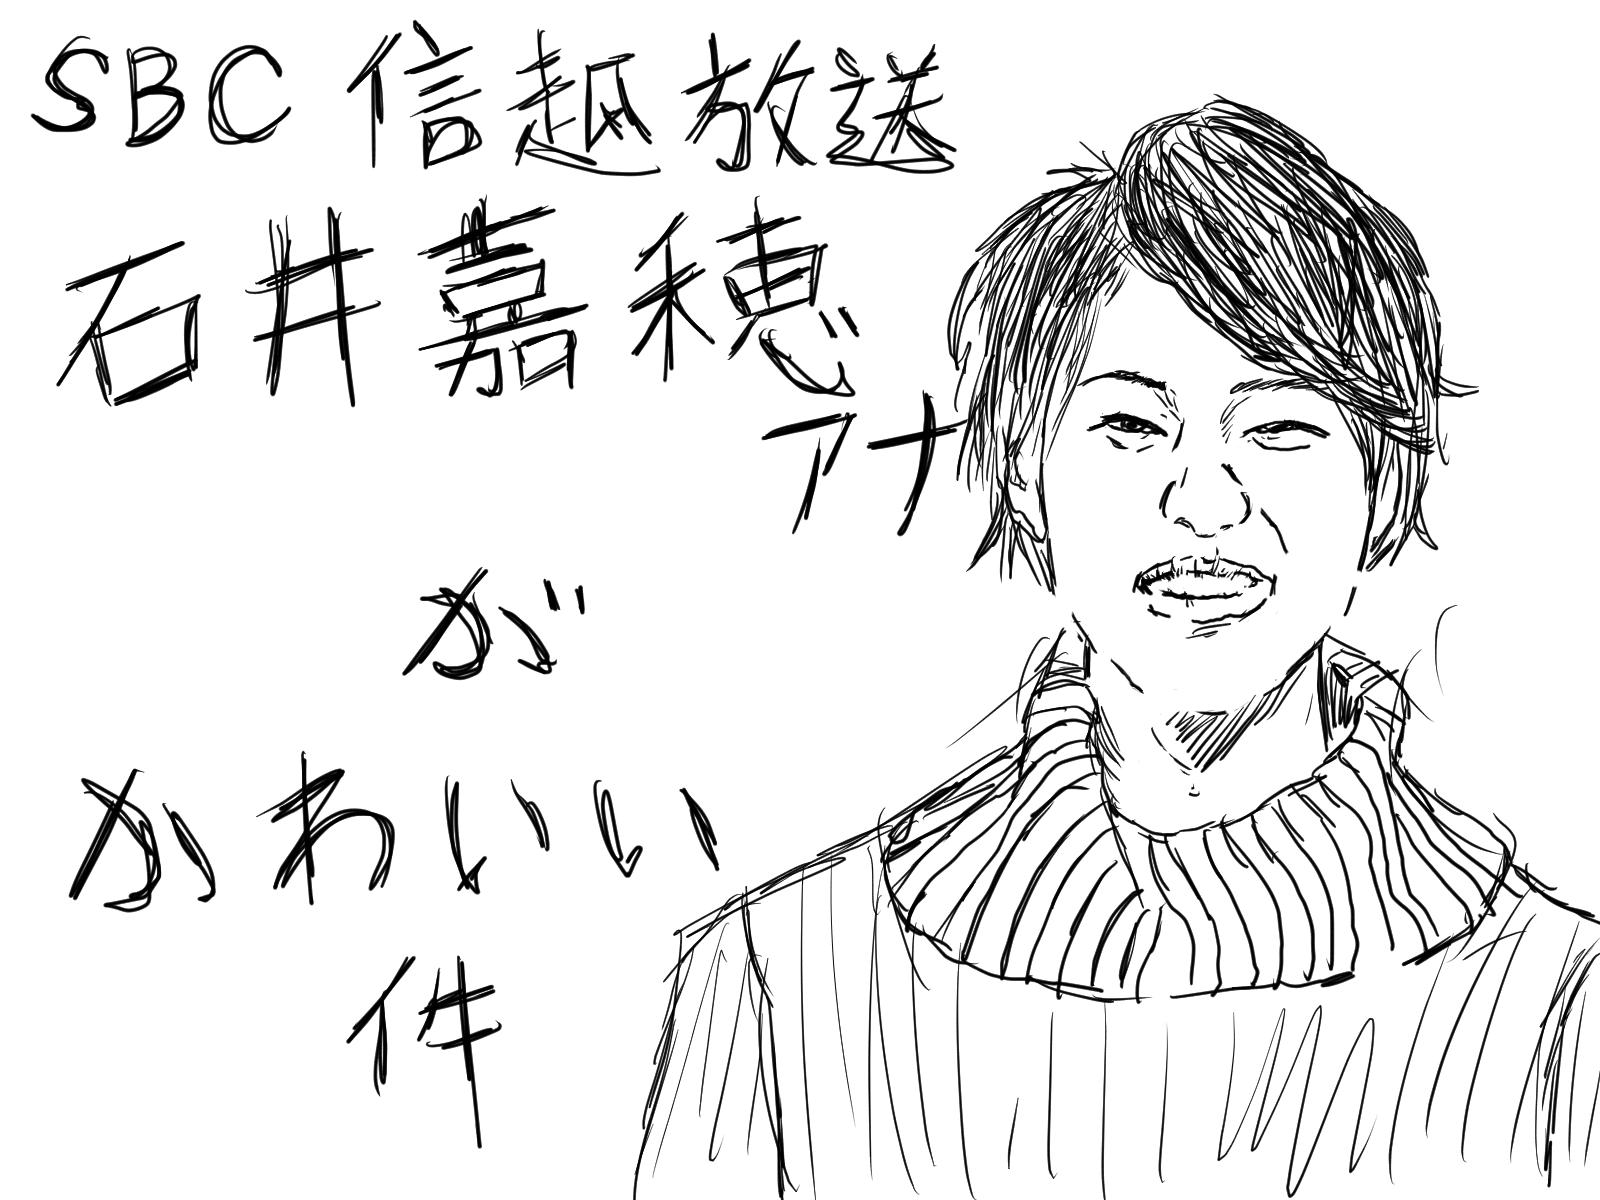 【SBC信越放送】石井嘉穂アナウンサーがかわいい件